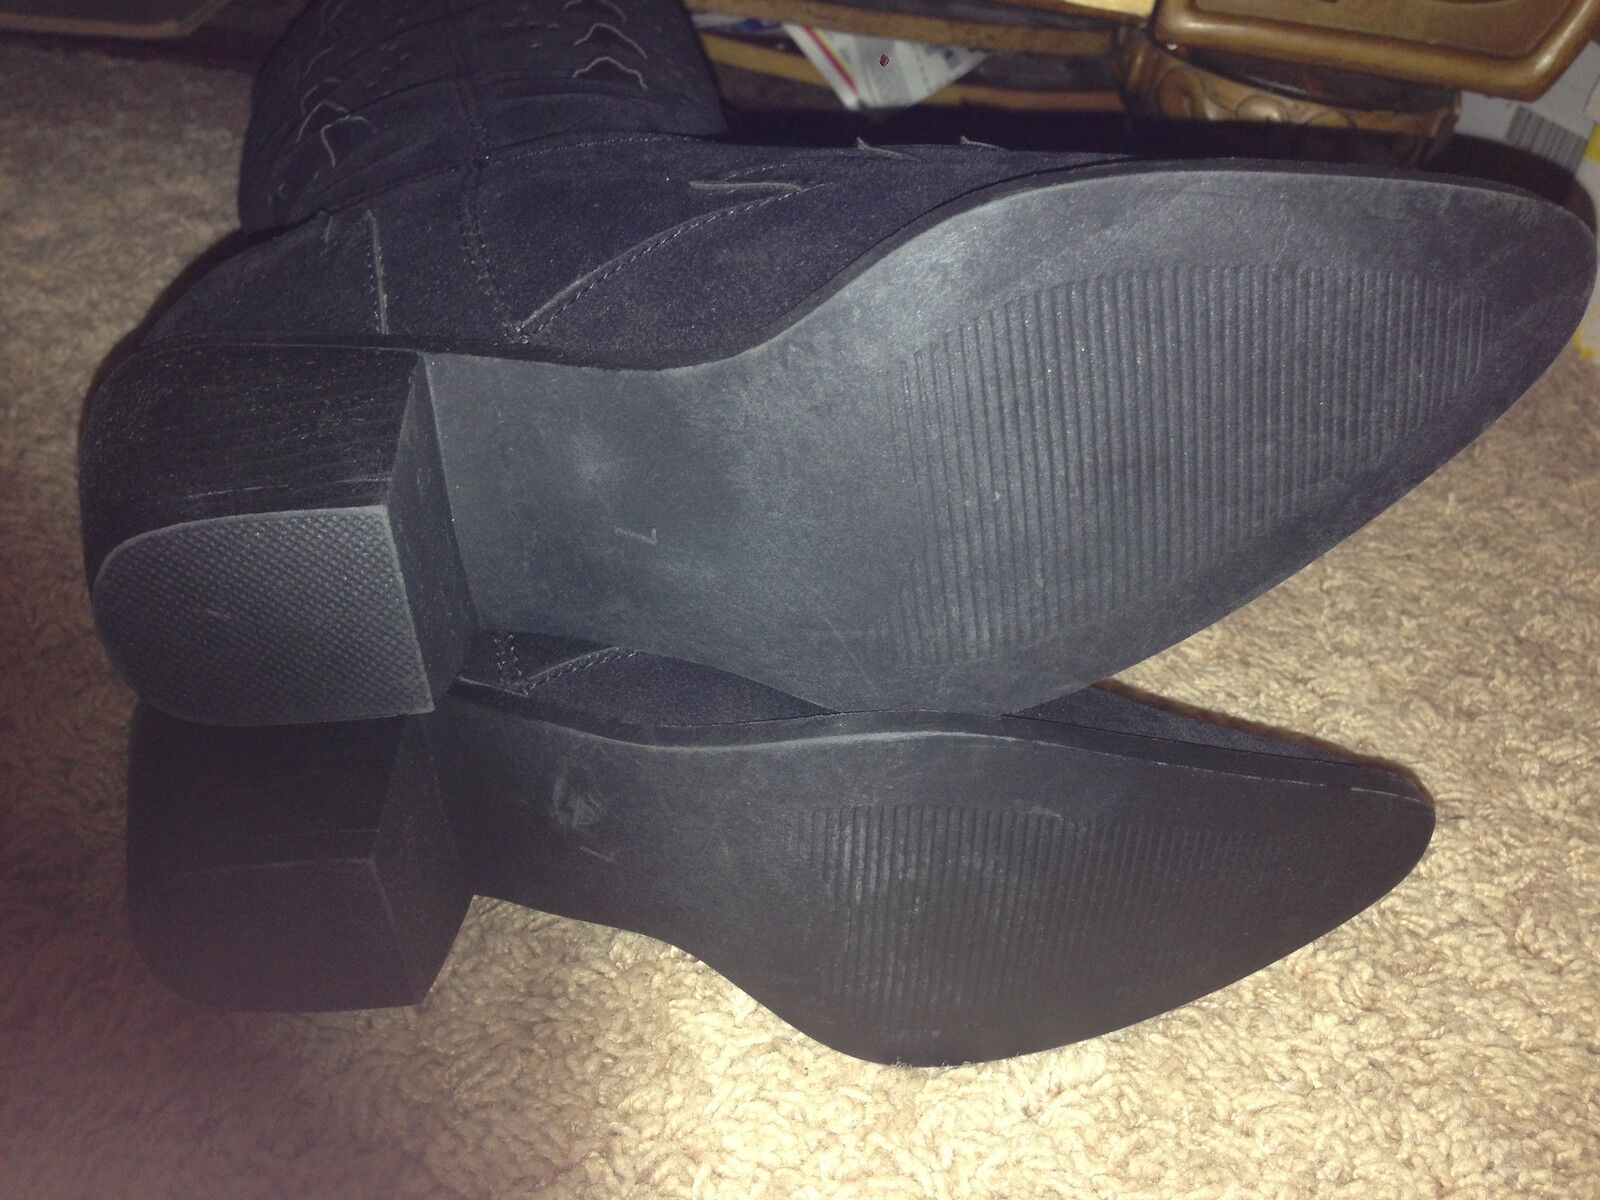 Roper Roper Roper Cowgirl Boots Cross Cut Out Black 7.5 fc43c4